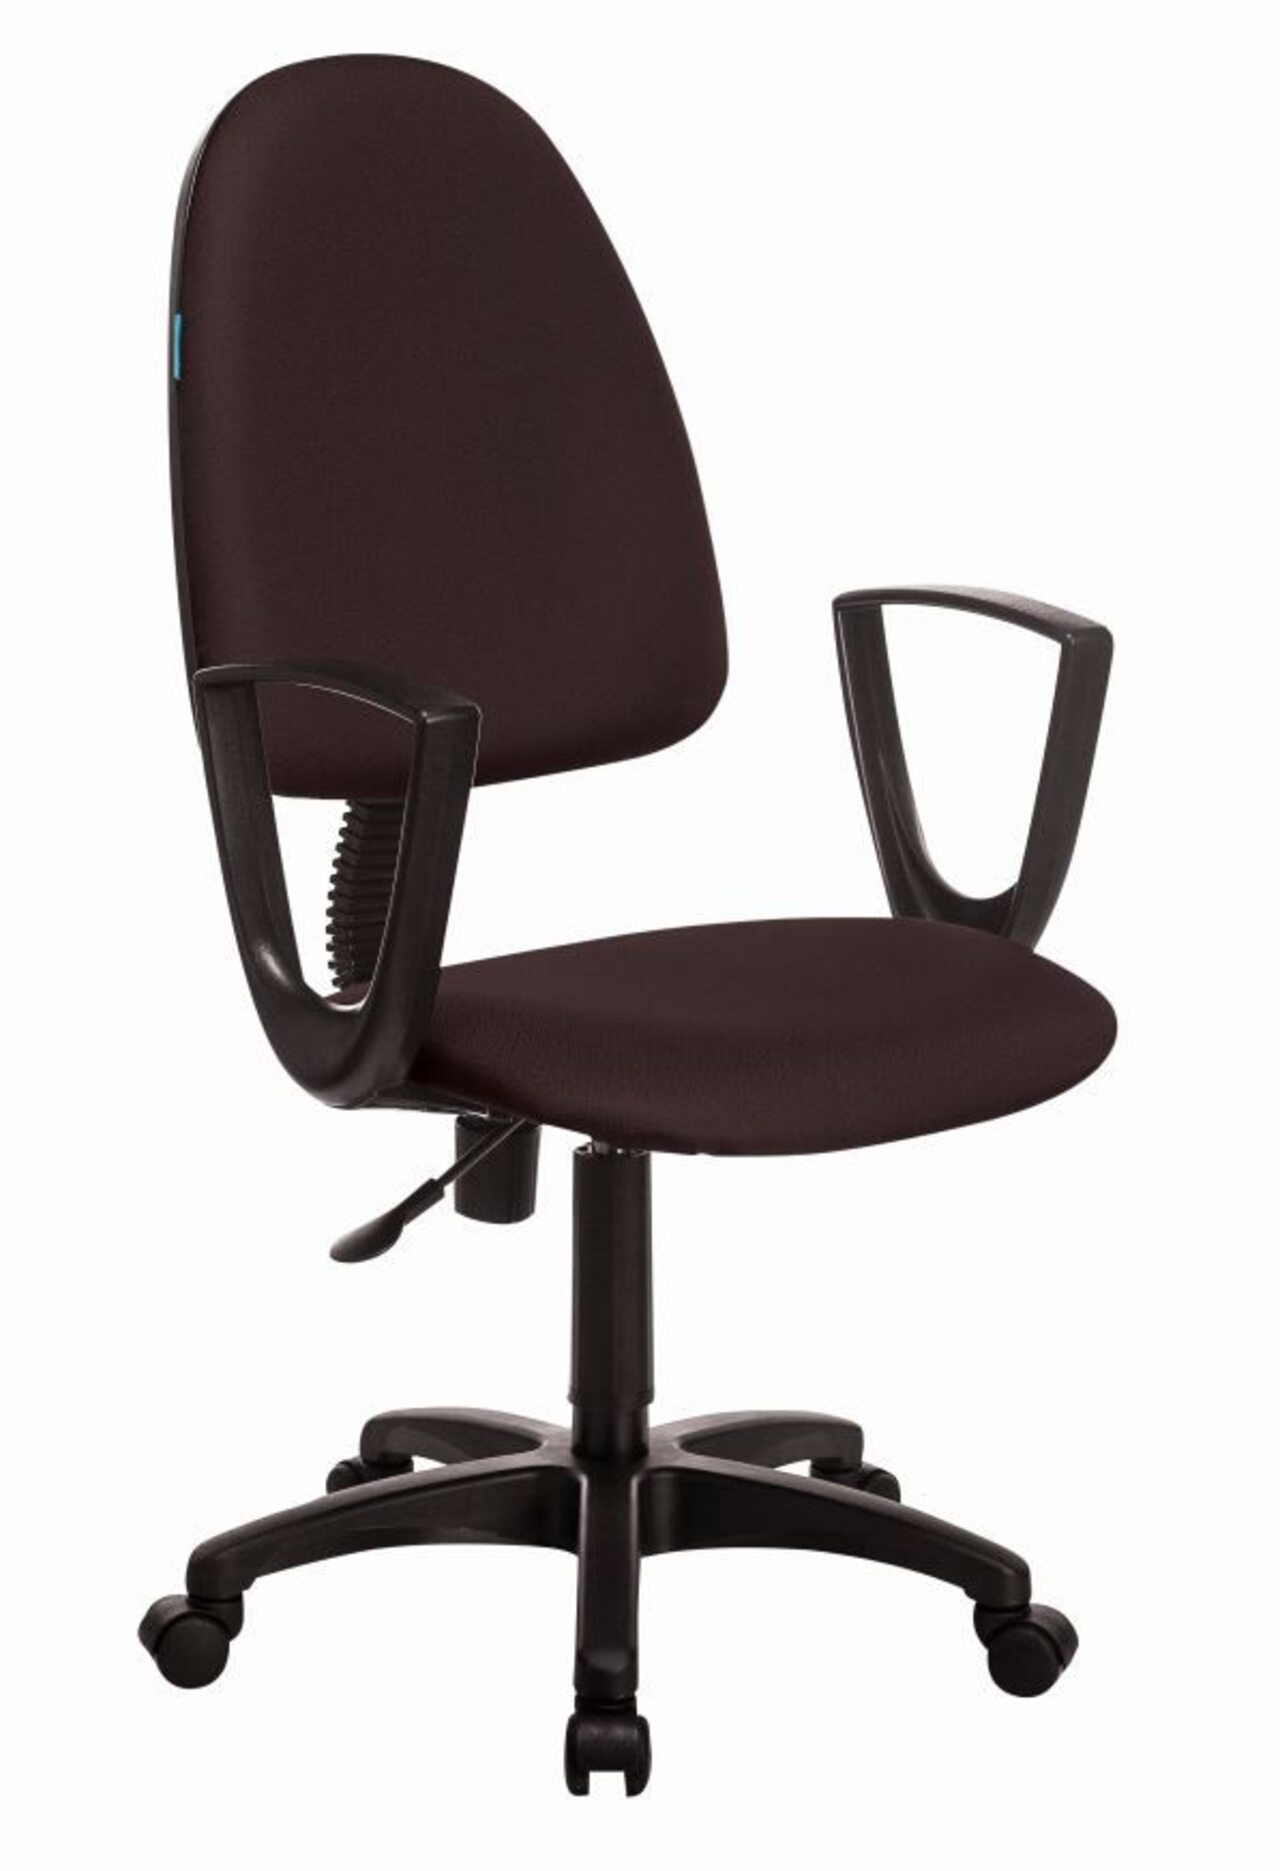 Кресло для персонала CH-1300N/3C - фото 1